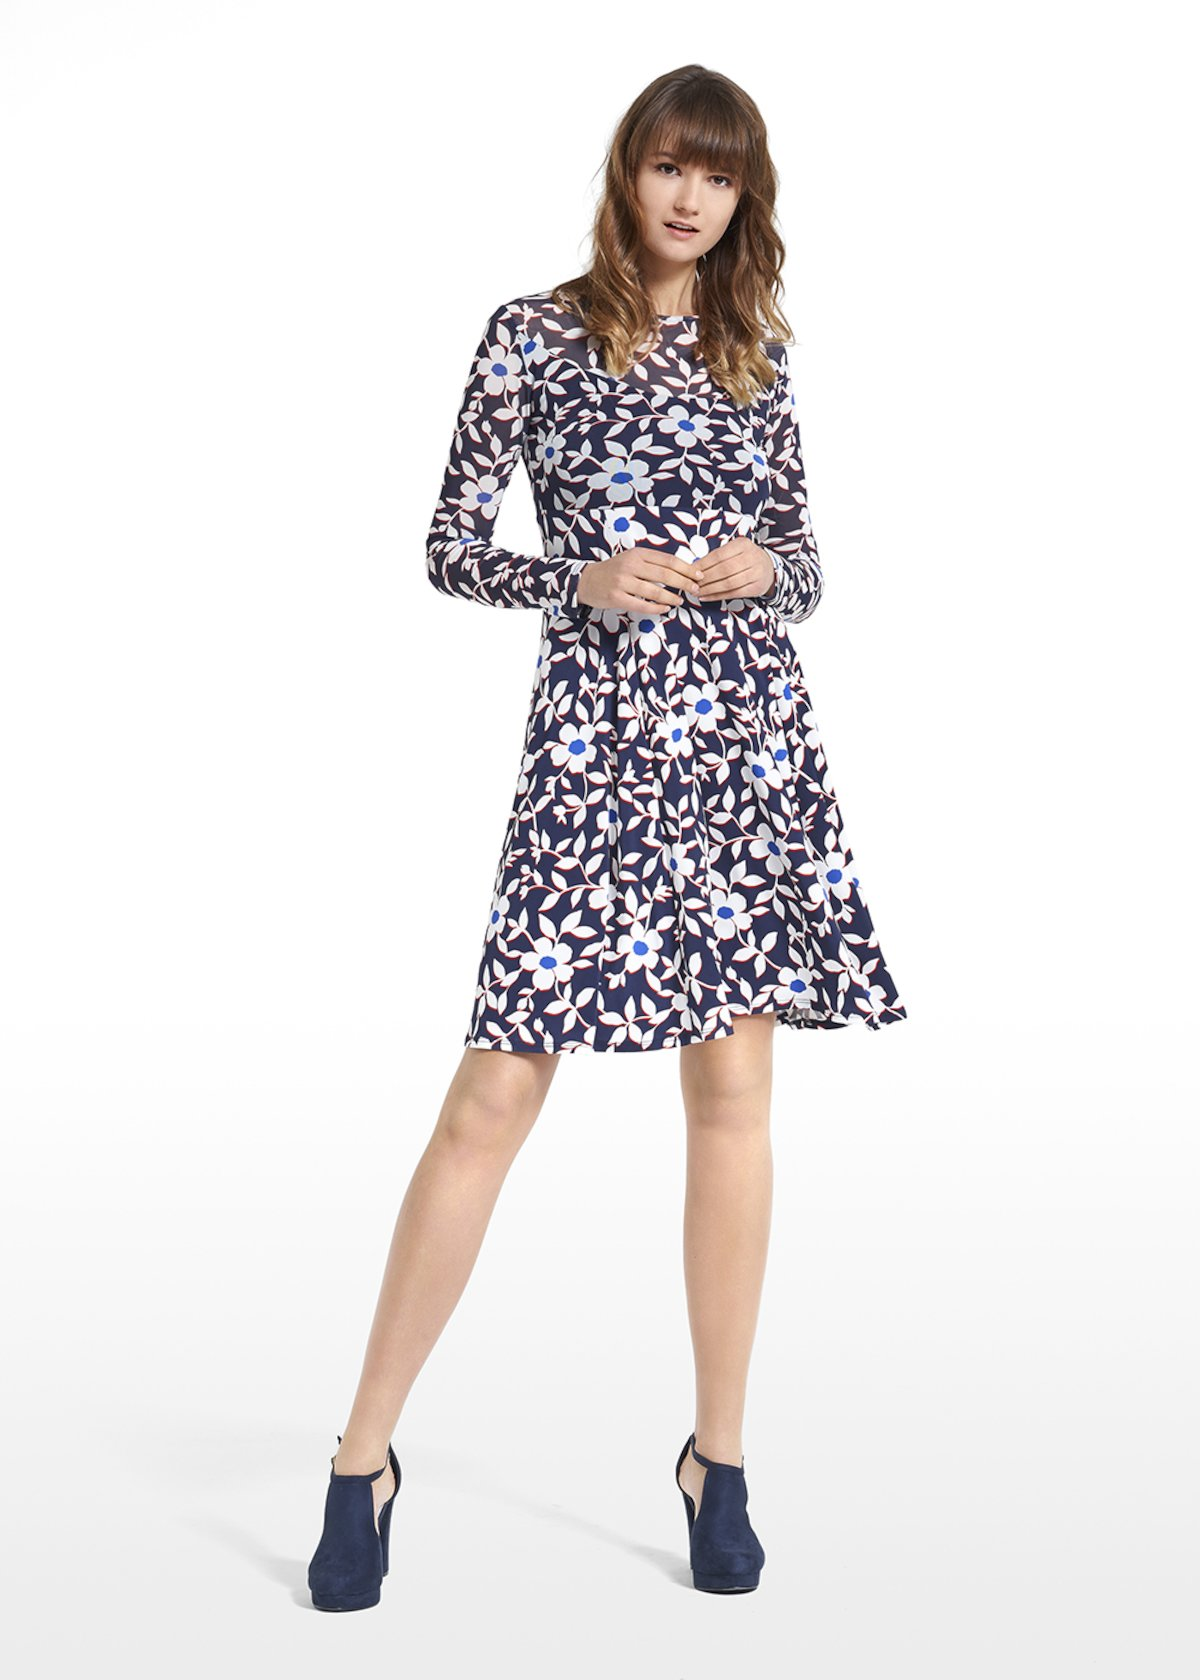 Patterned blue jasmine dress Adele